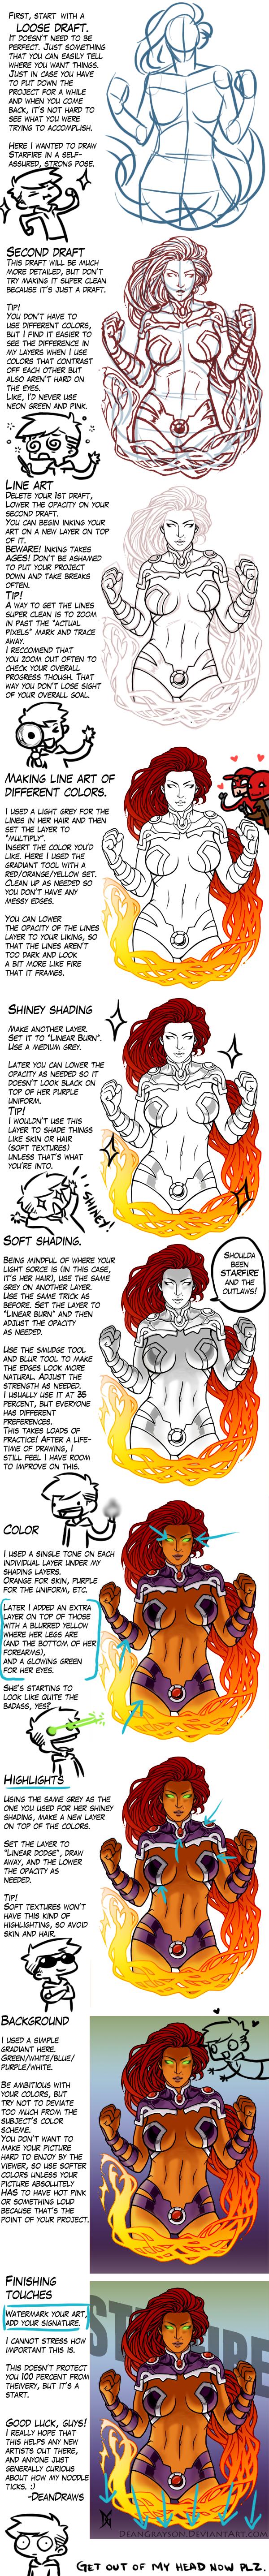 Starfire step by step by DeanGrayson